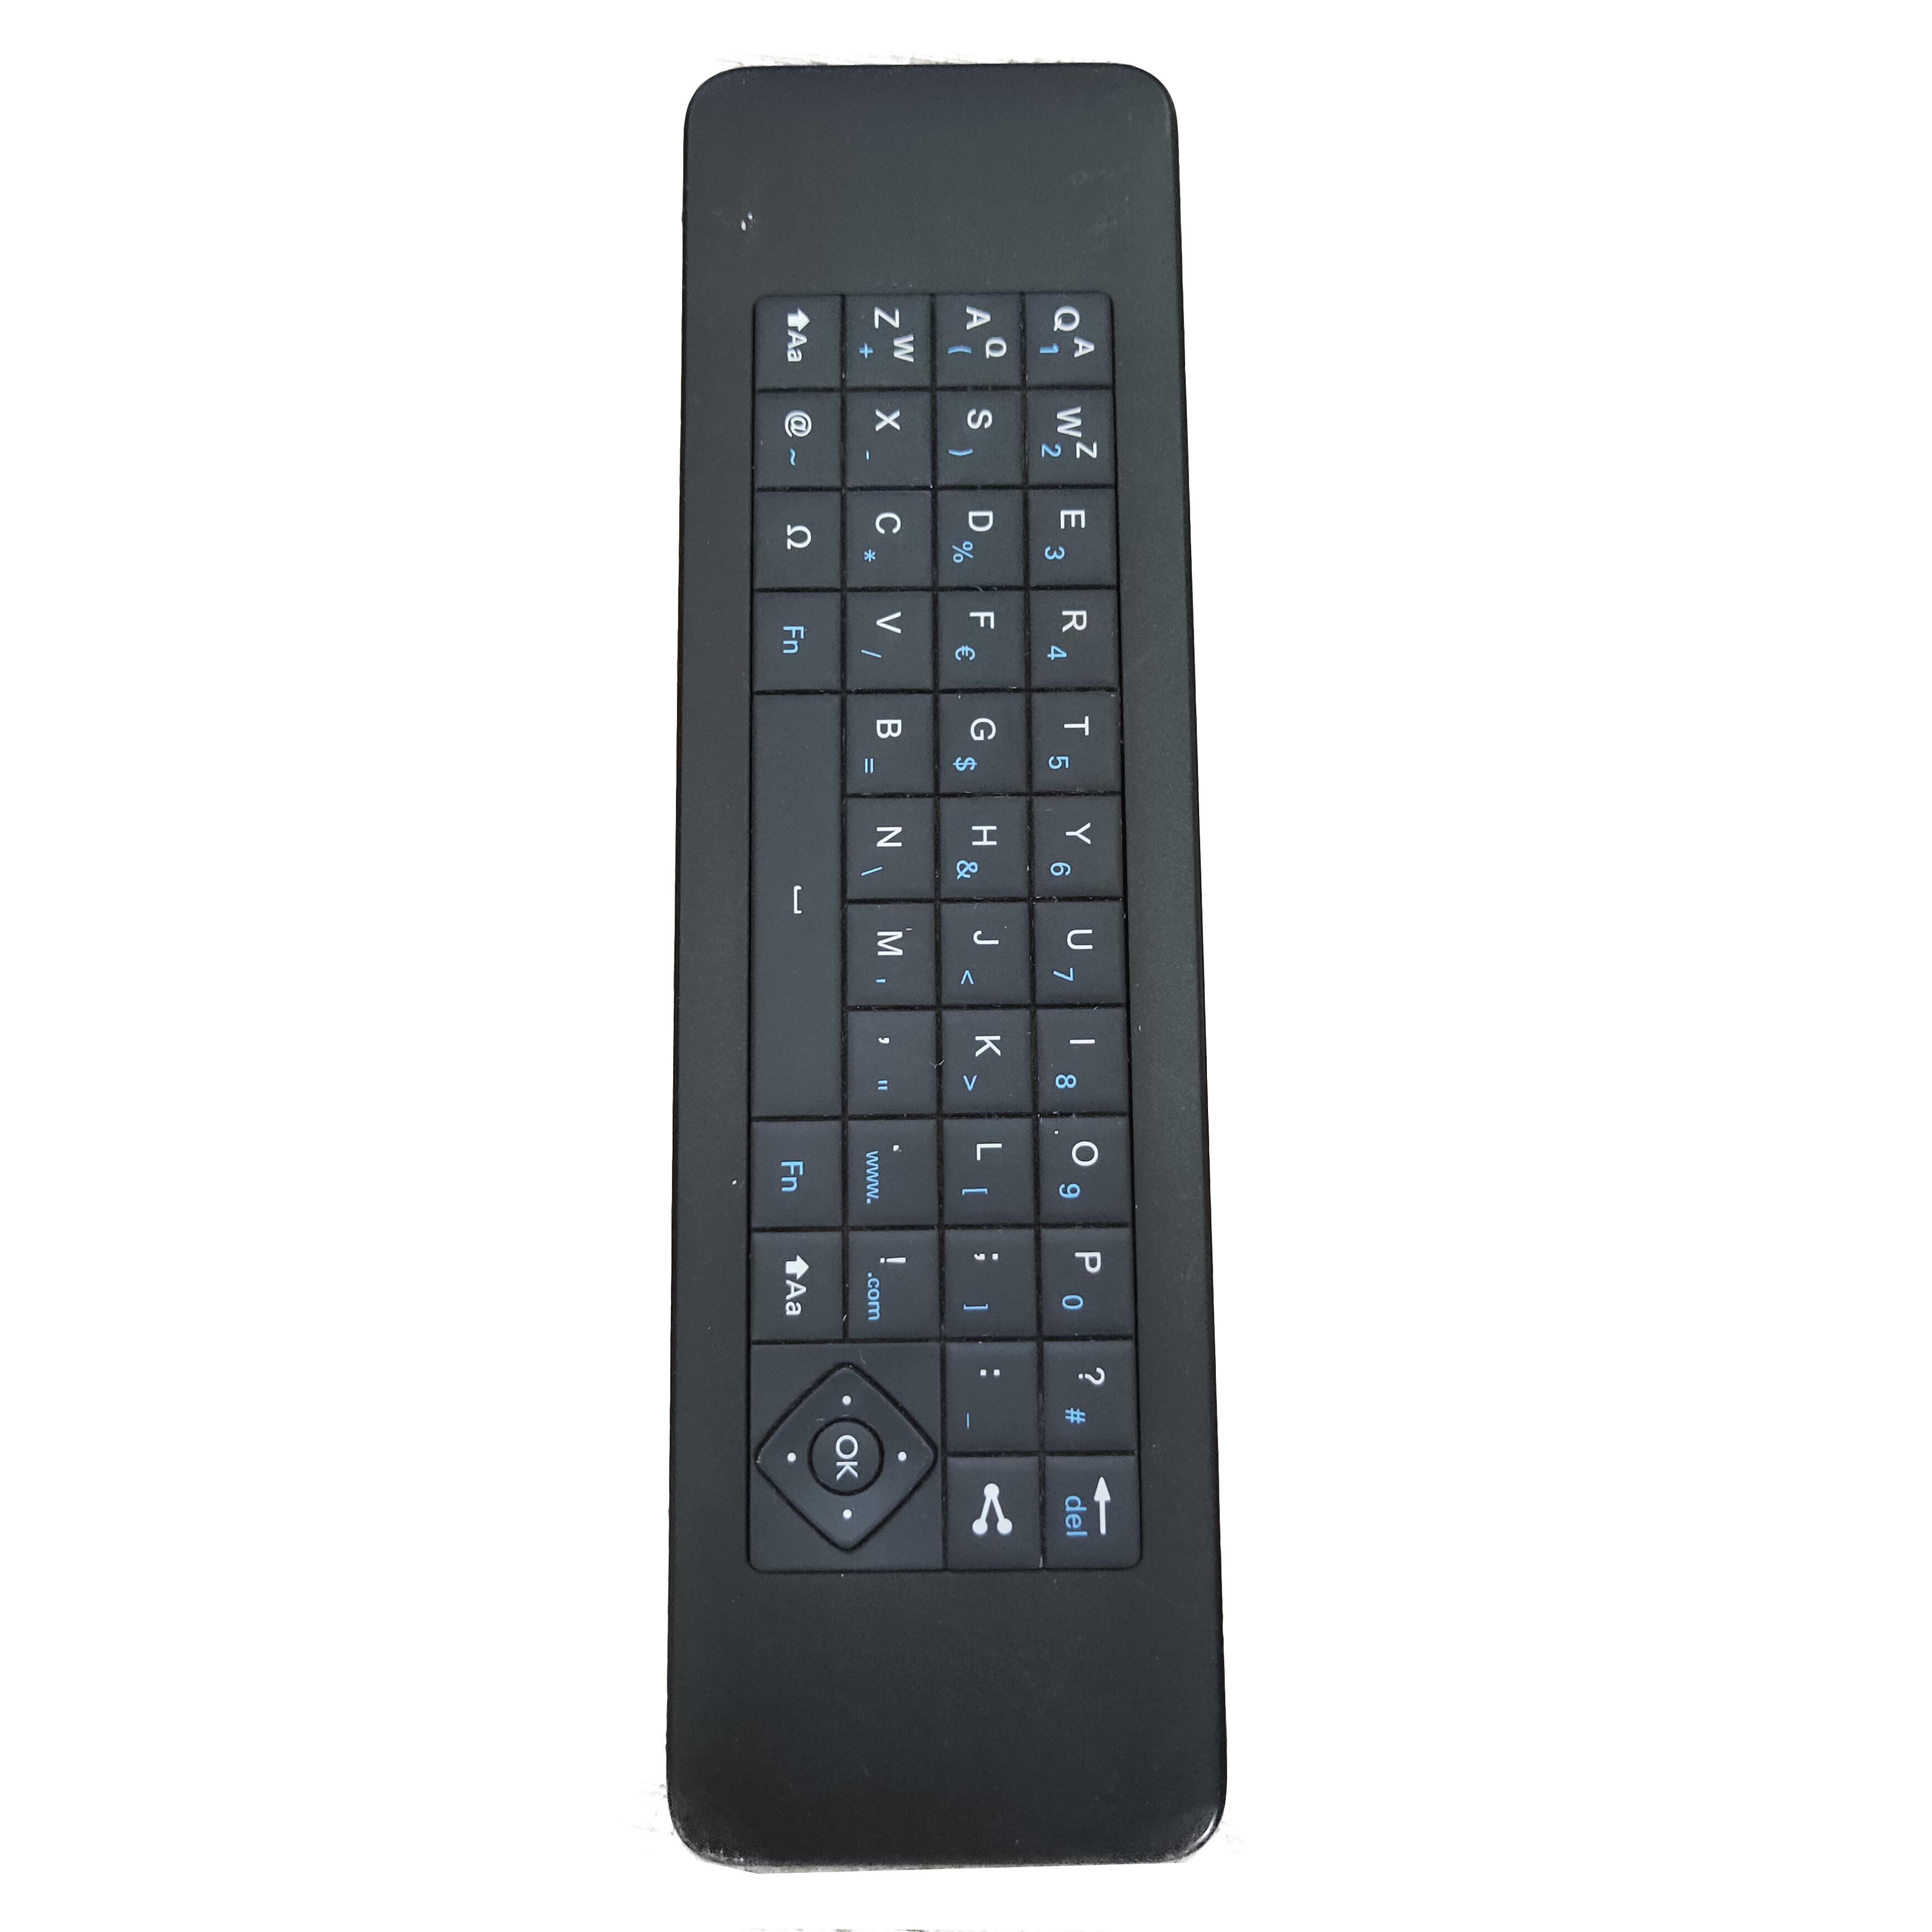 Image 5 - NEW Original 398GR10BEPHN0004HT 398GR10BEPHN005AHT For PHILIPS TV  Remote Control NETFLIX Control RemotoRemote Controls